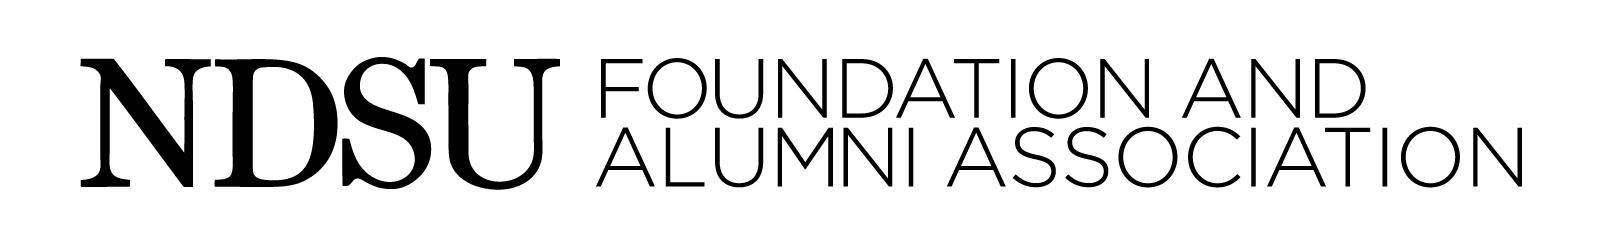 NDSU Foundation